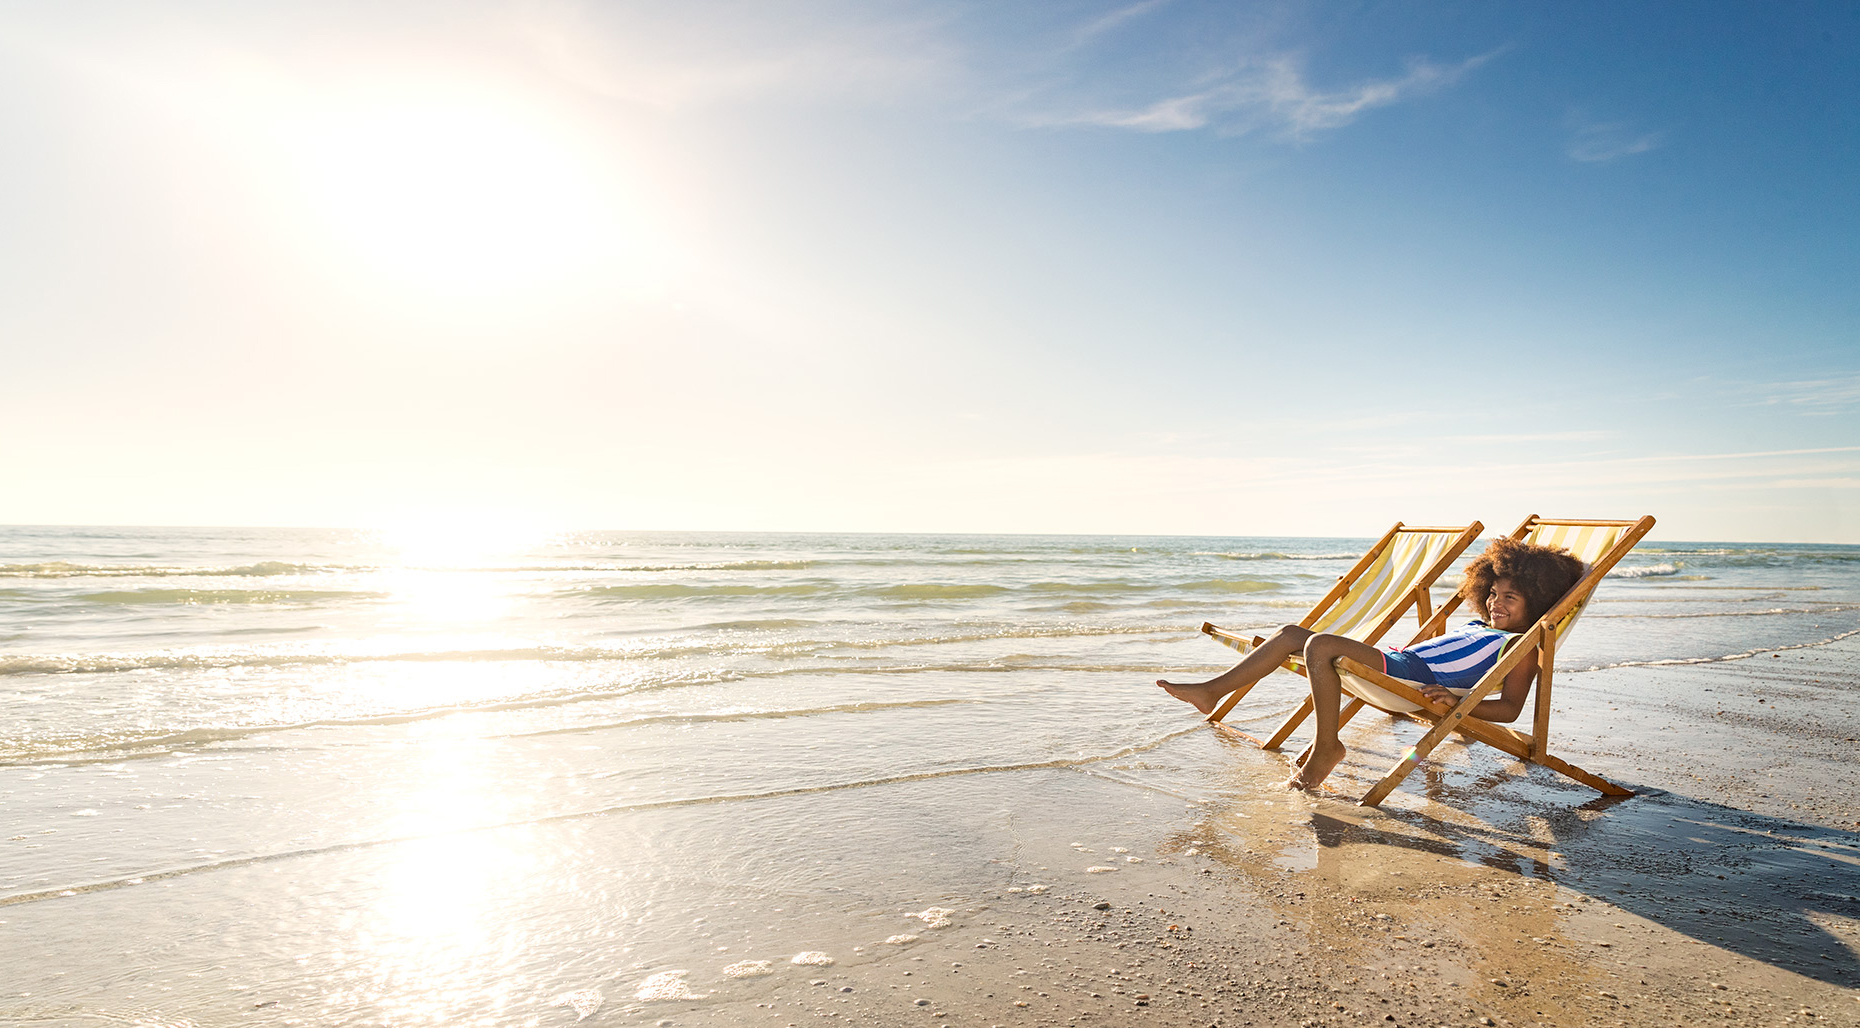 47_Beach_LoungeChair_AA_Girl_Day5_24873-1.jpg